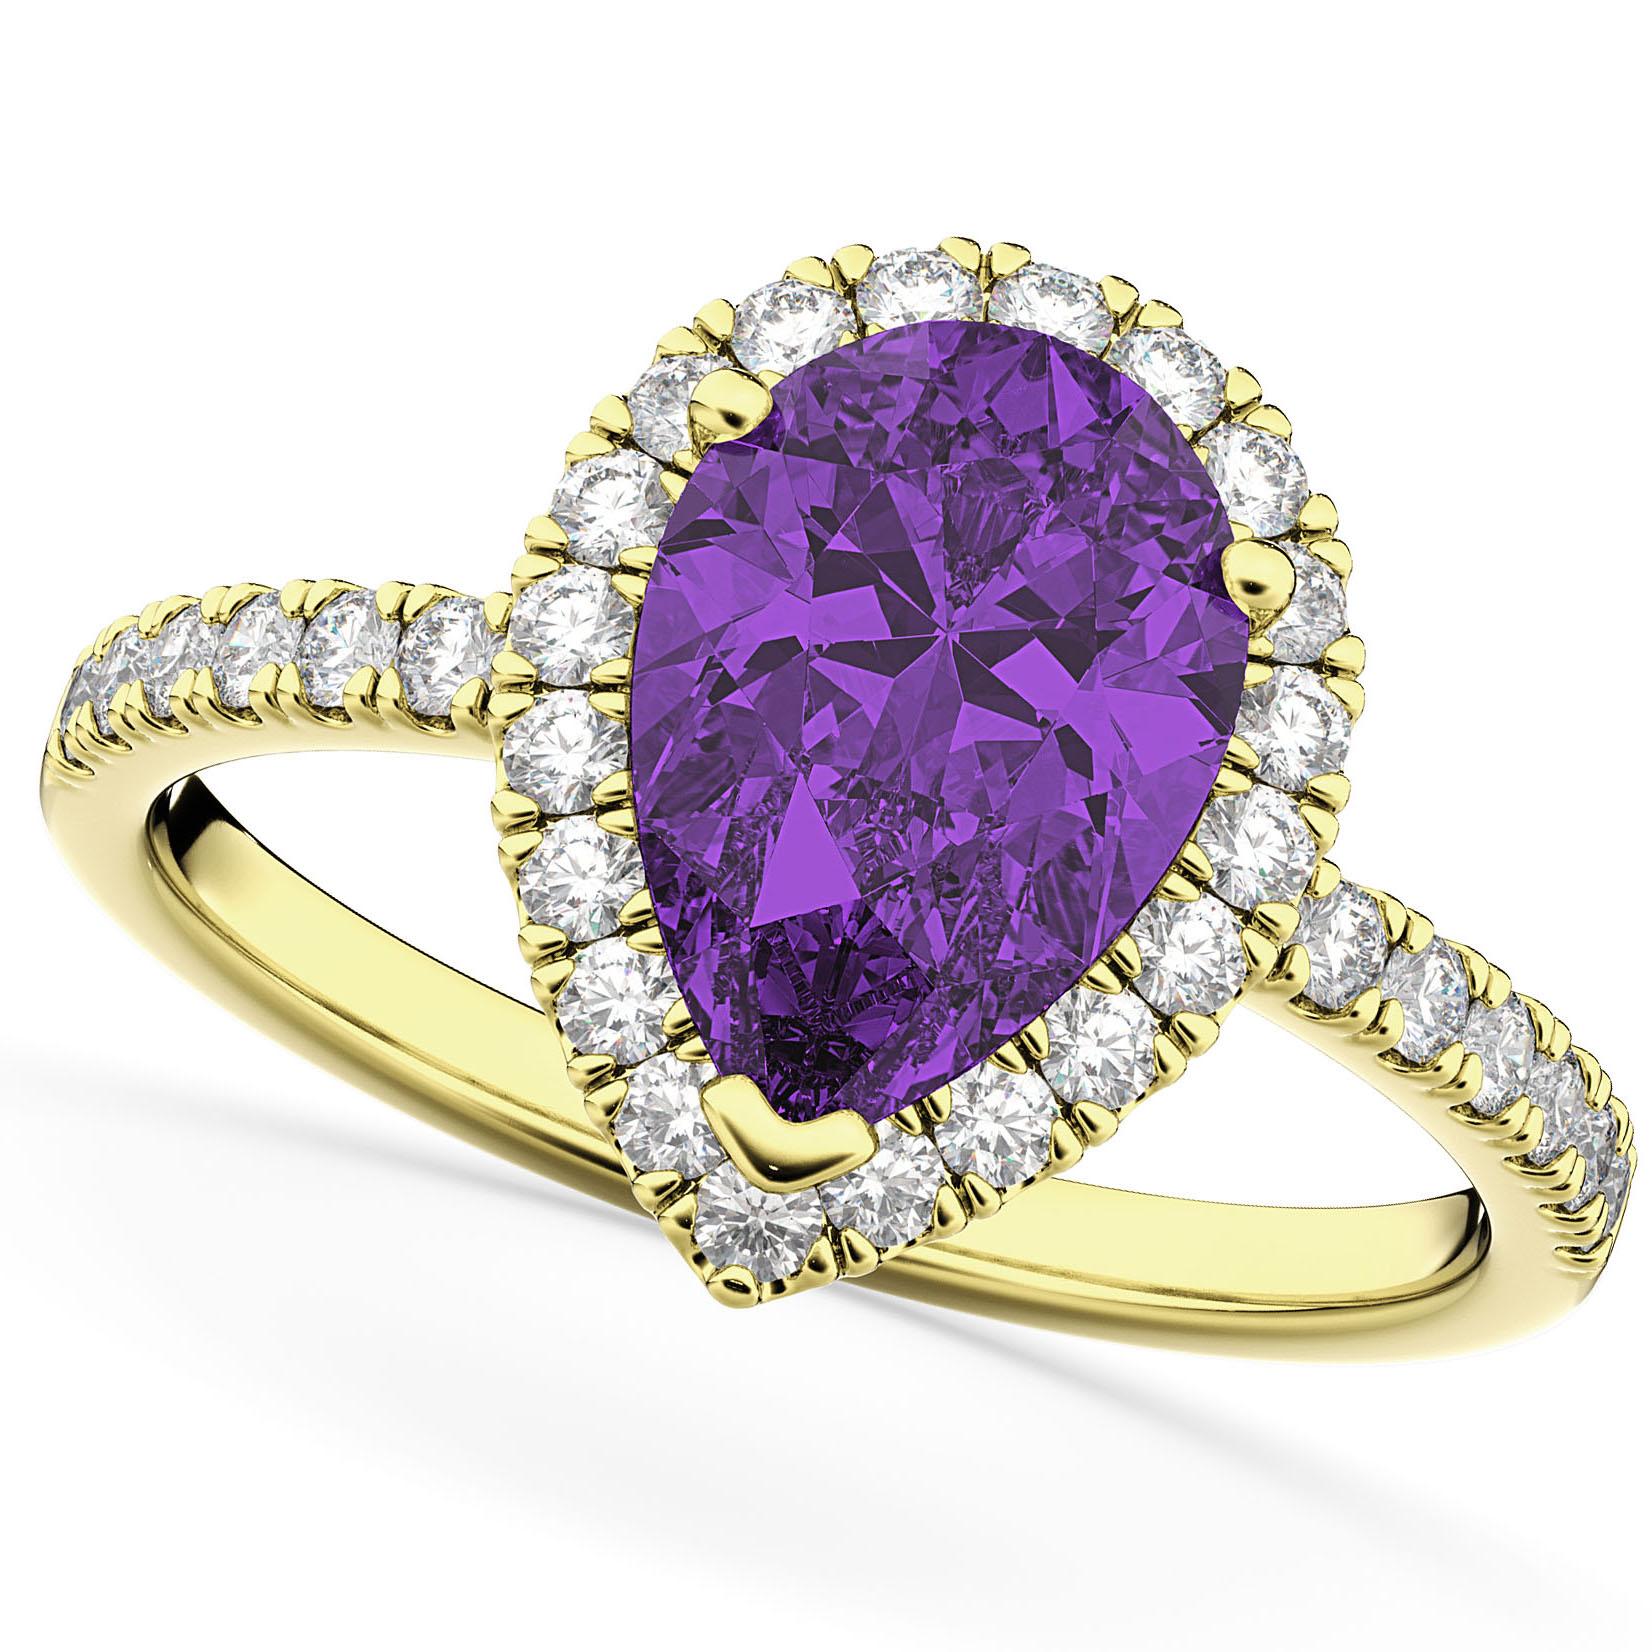 Pear Cut Halo Amethyst & Diamond Engagement Ring 14K Yellow Gold 2.21ct